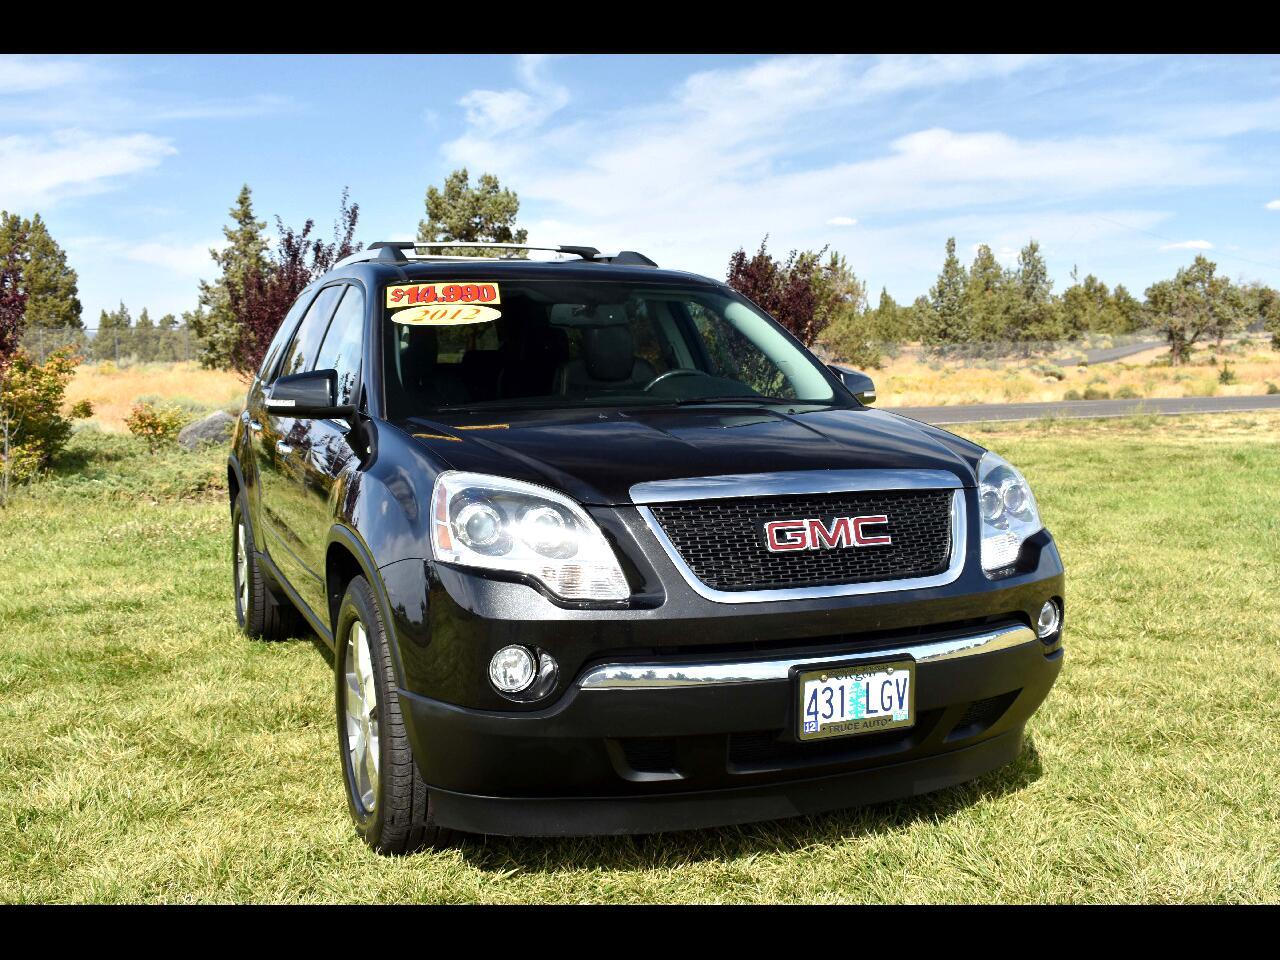 2012 GMC Acadia AWD 4dr SLT**LOW MILES**